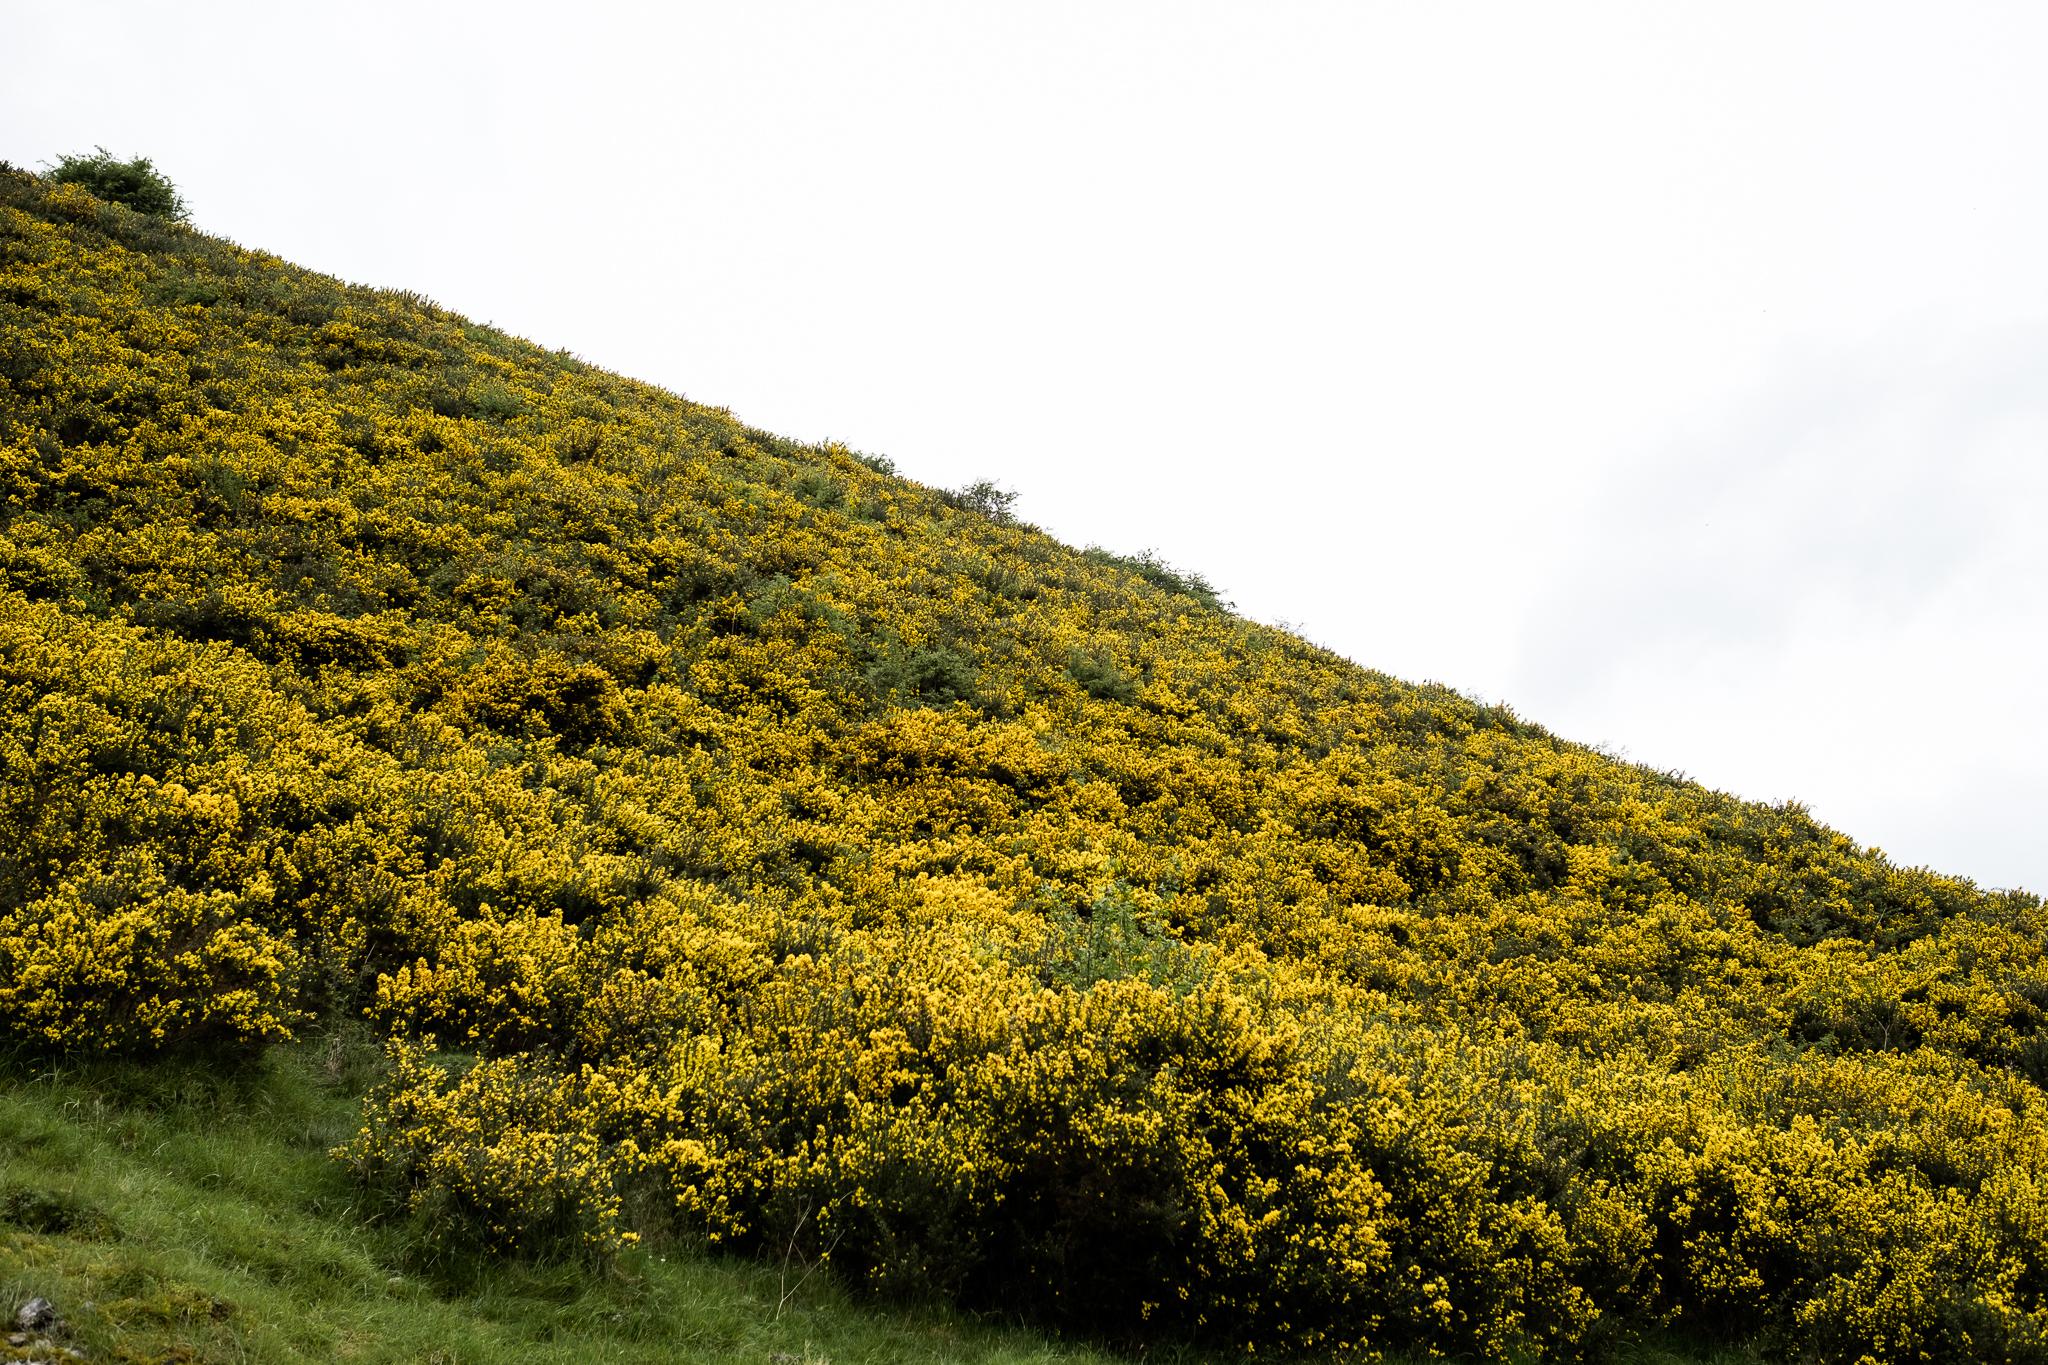 05.19.2017 The Photowalk Network Get Some Fresh Air Photowalk at Hartington and Biggin, Staffordshire Peak District National Trust-19.jpg